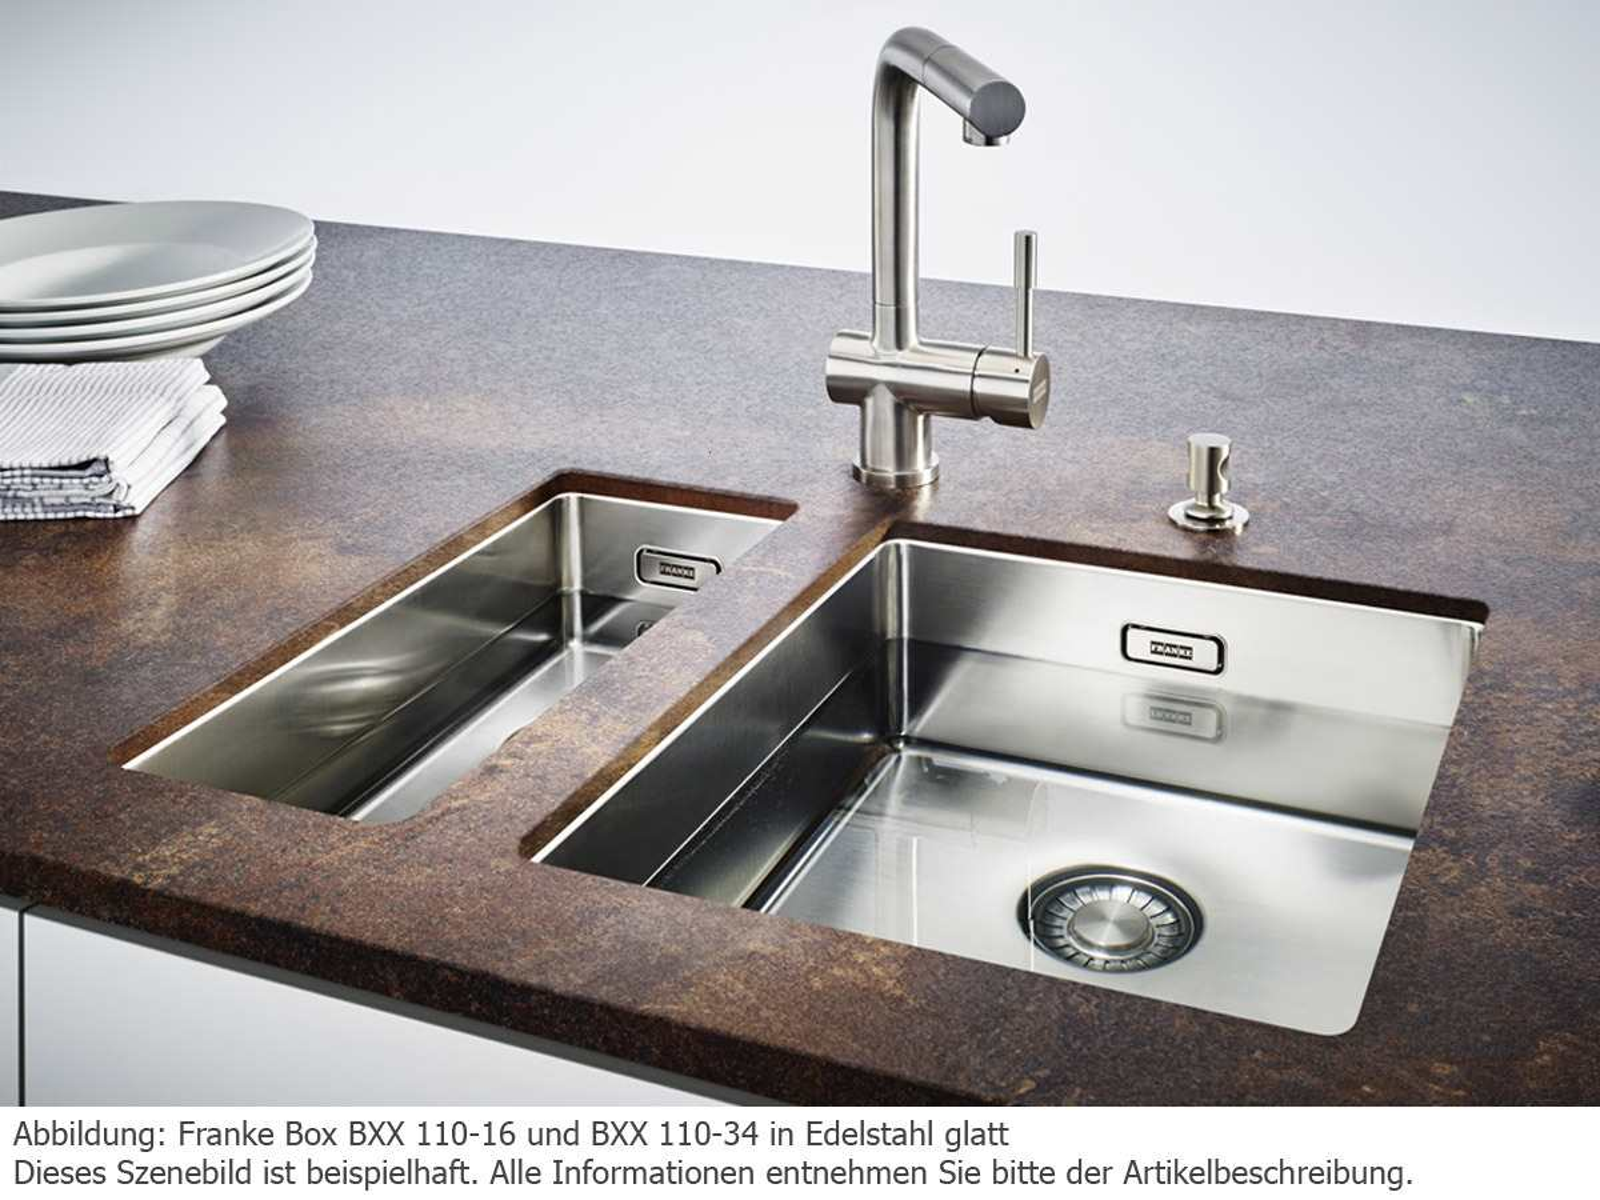 Franke Box BXX 110-34 Edelstahlspüle glatt - 122.0374.689 Unterbau